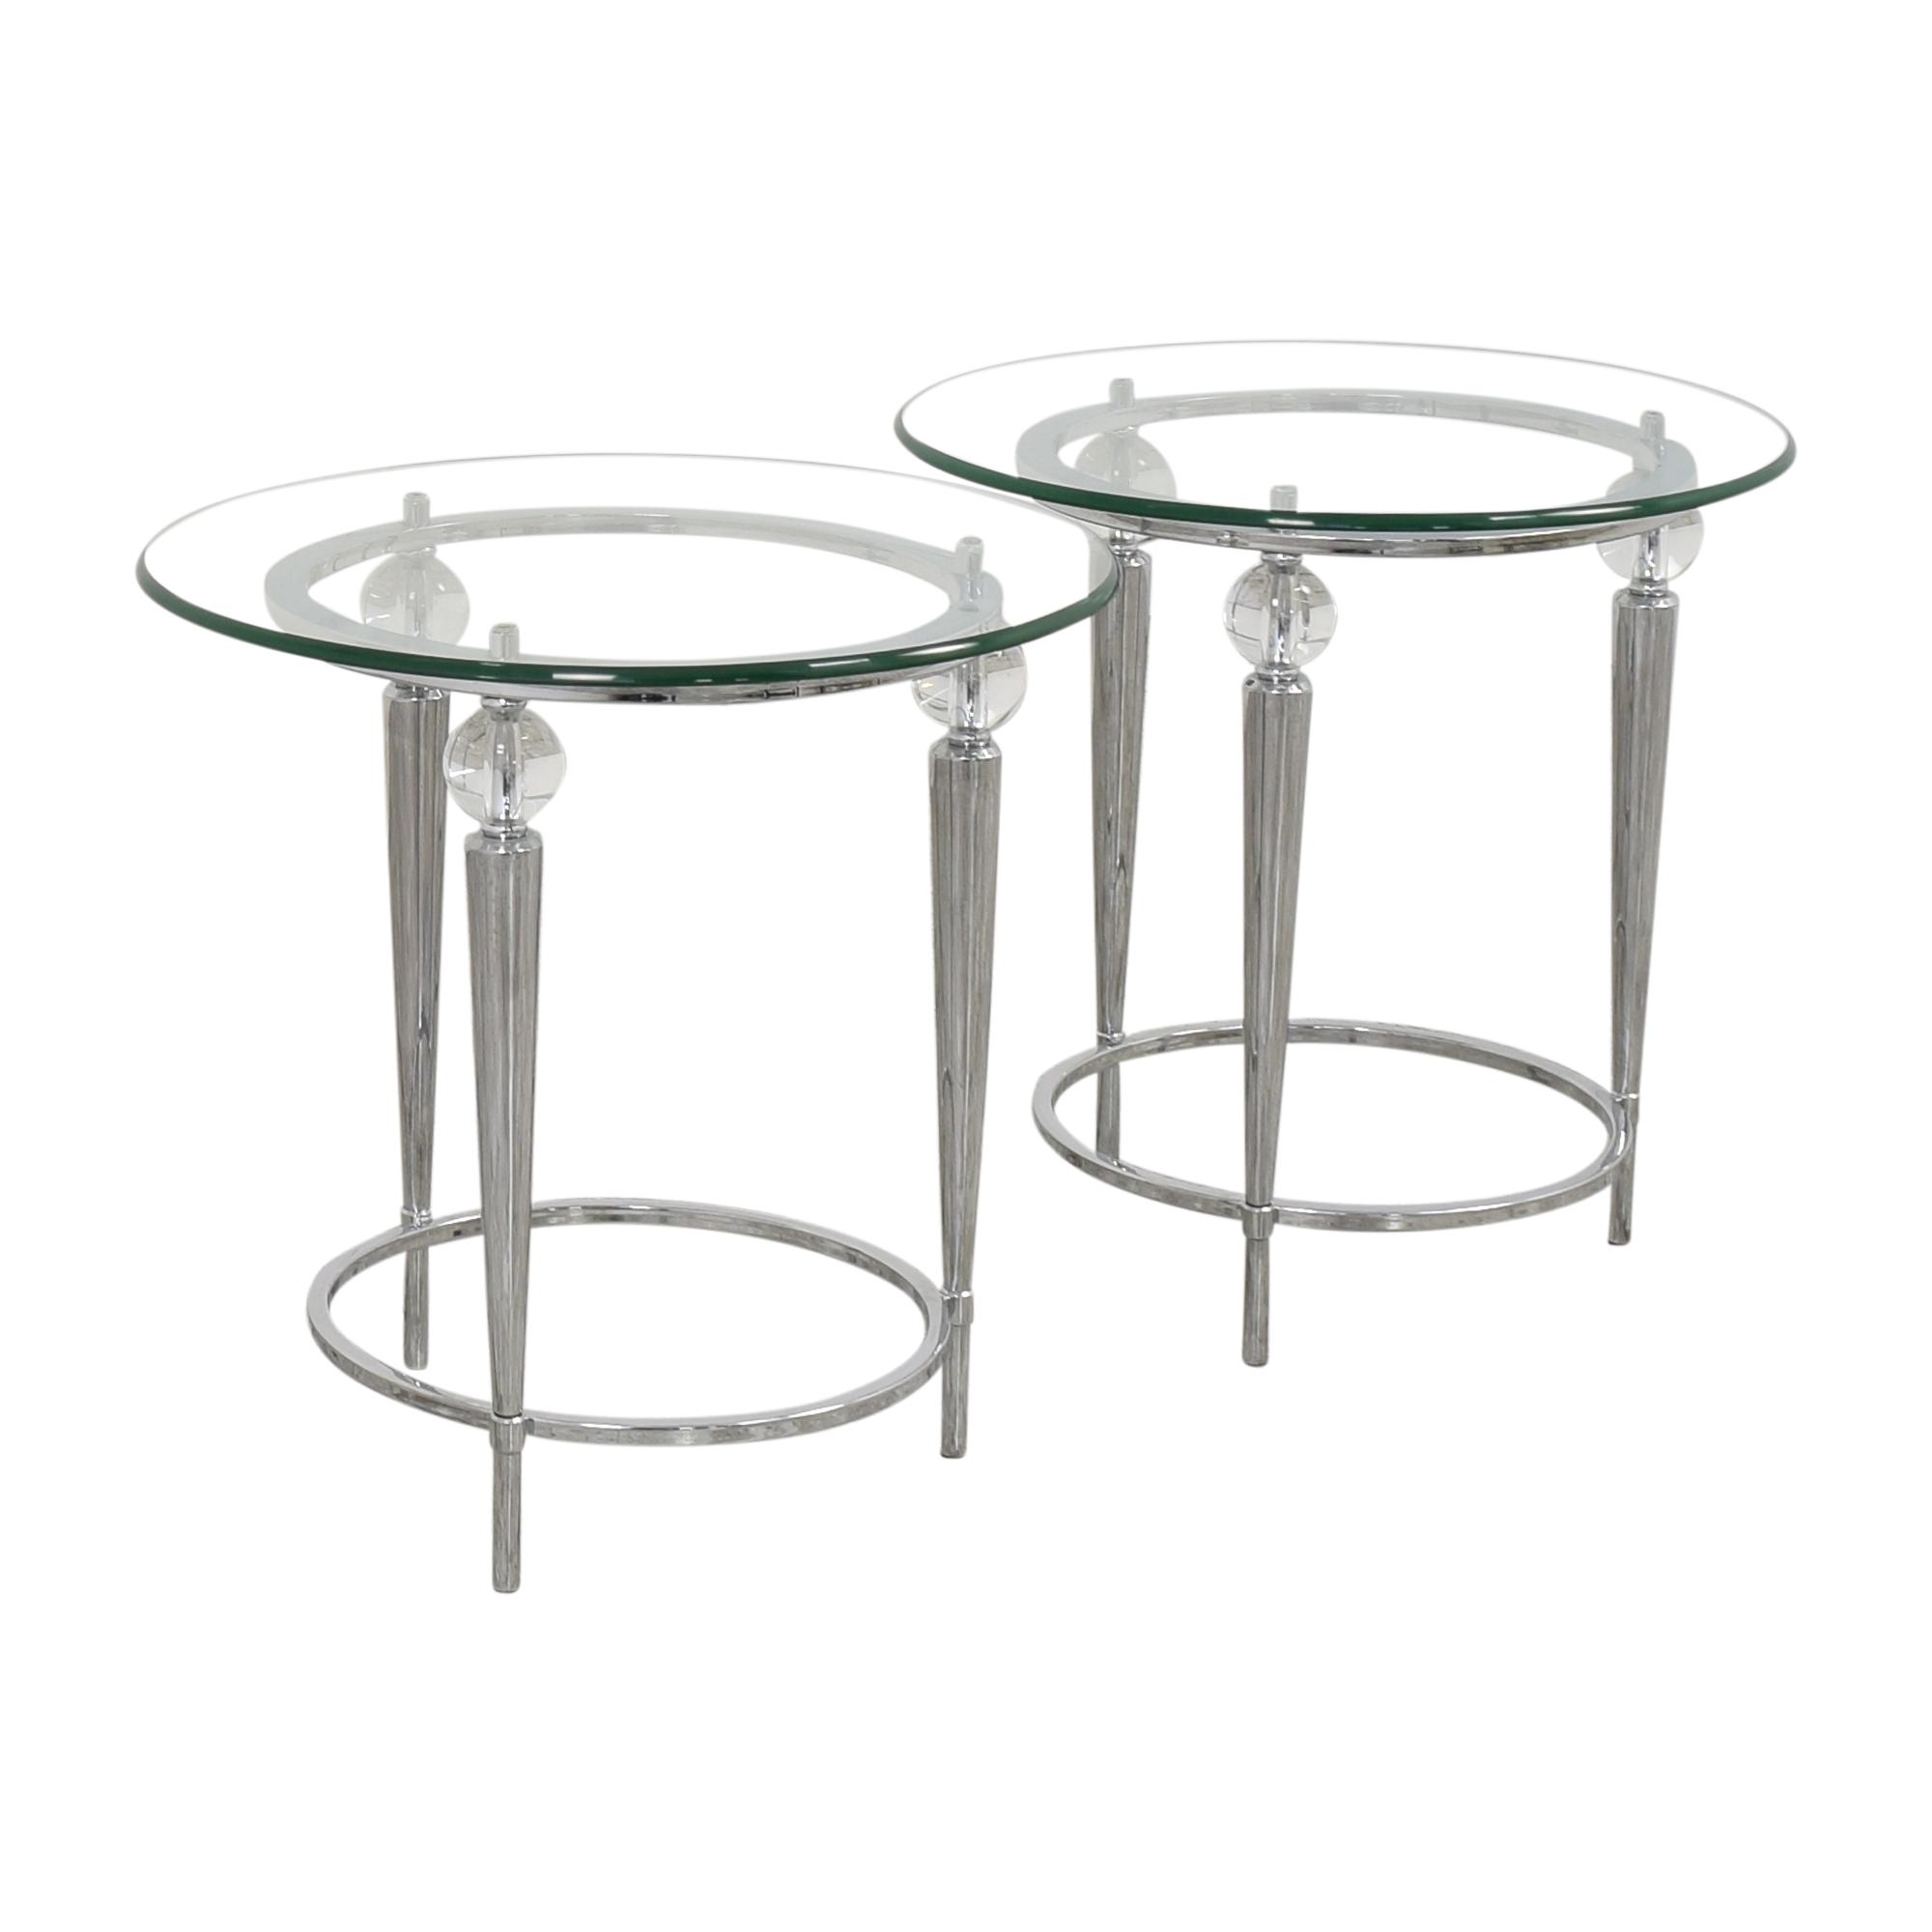 AllModern AllModern Round Glass Top Side Tables for sale